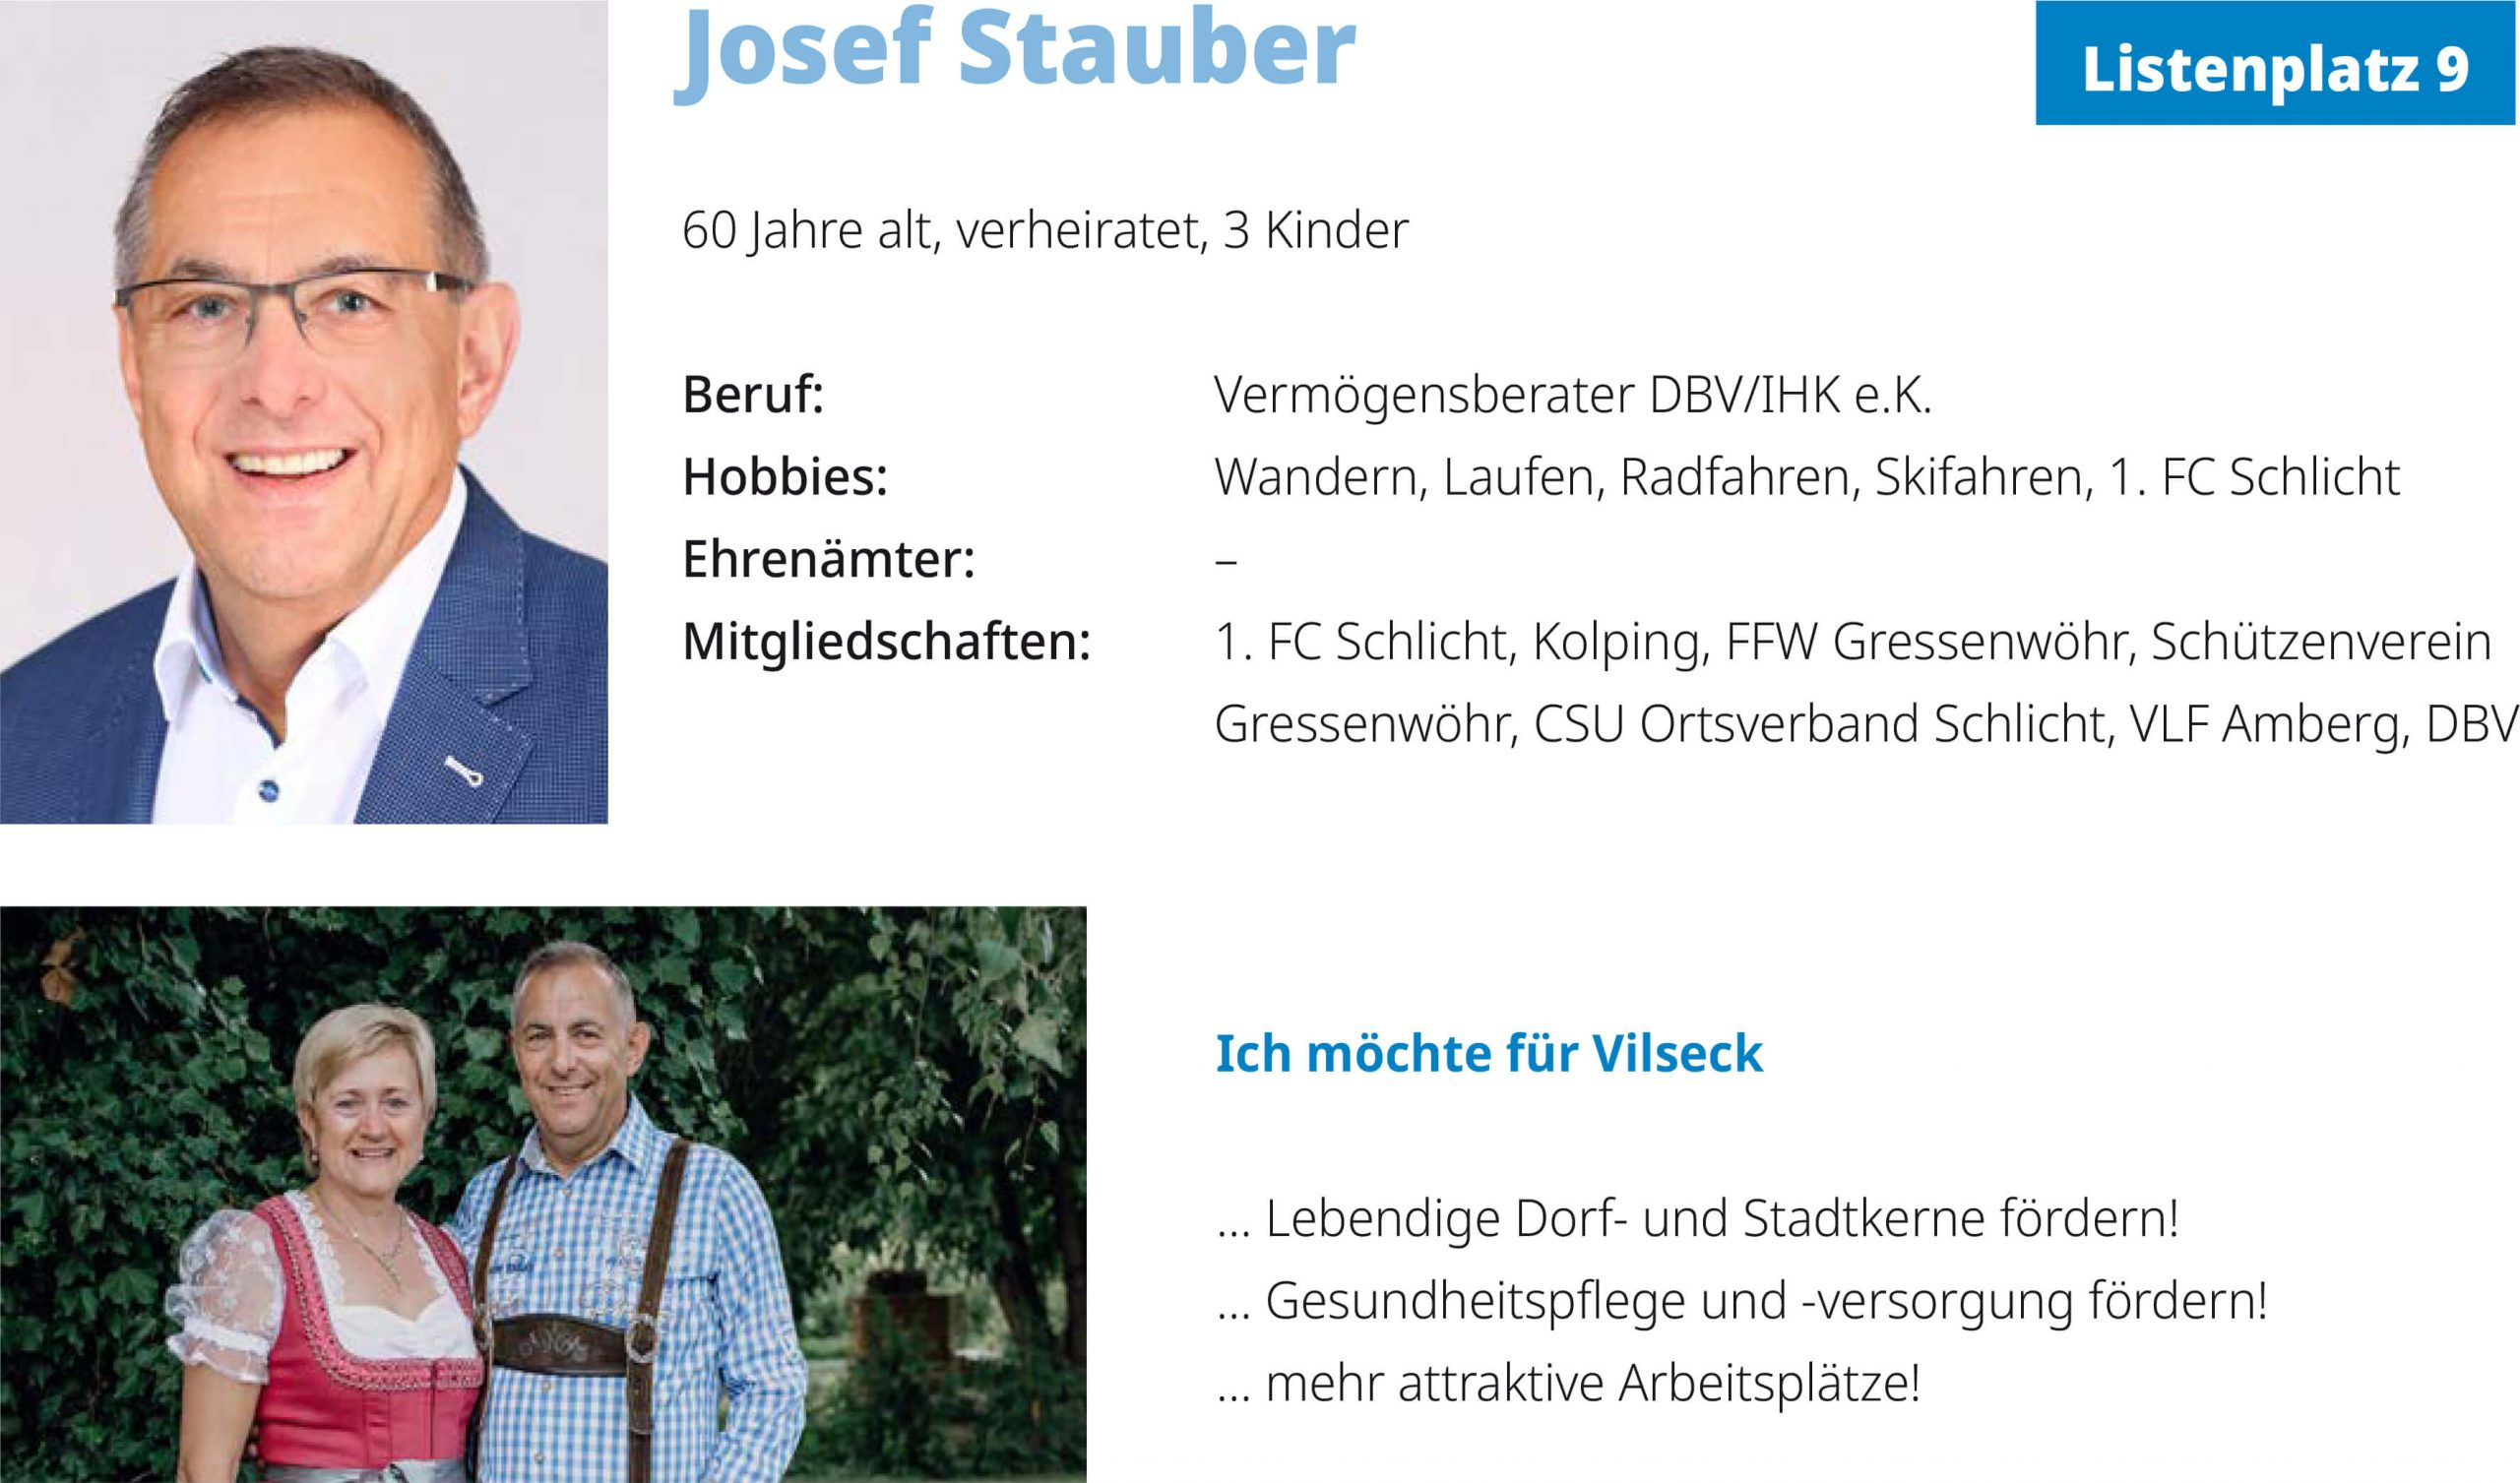 Josef Stauber